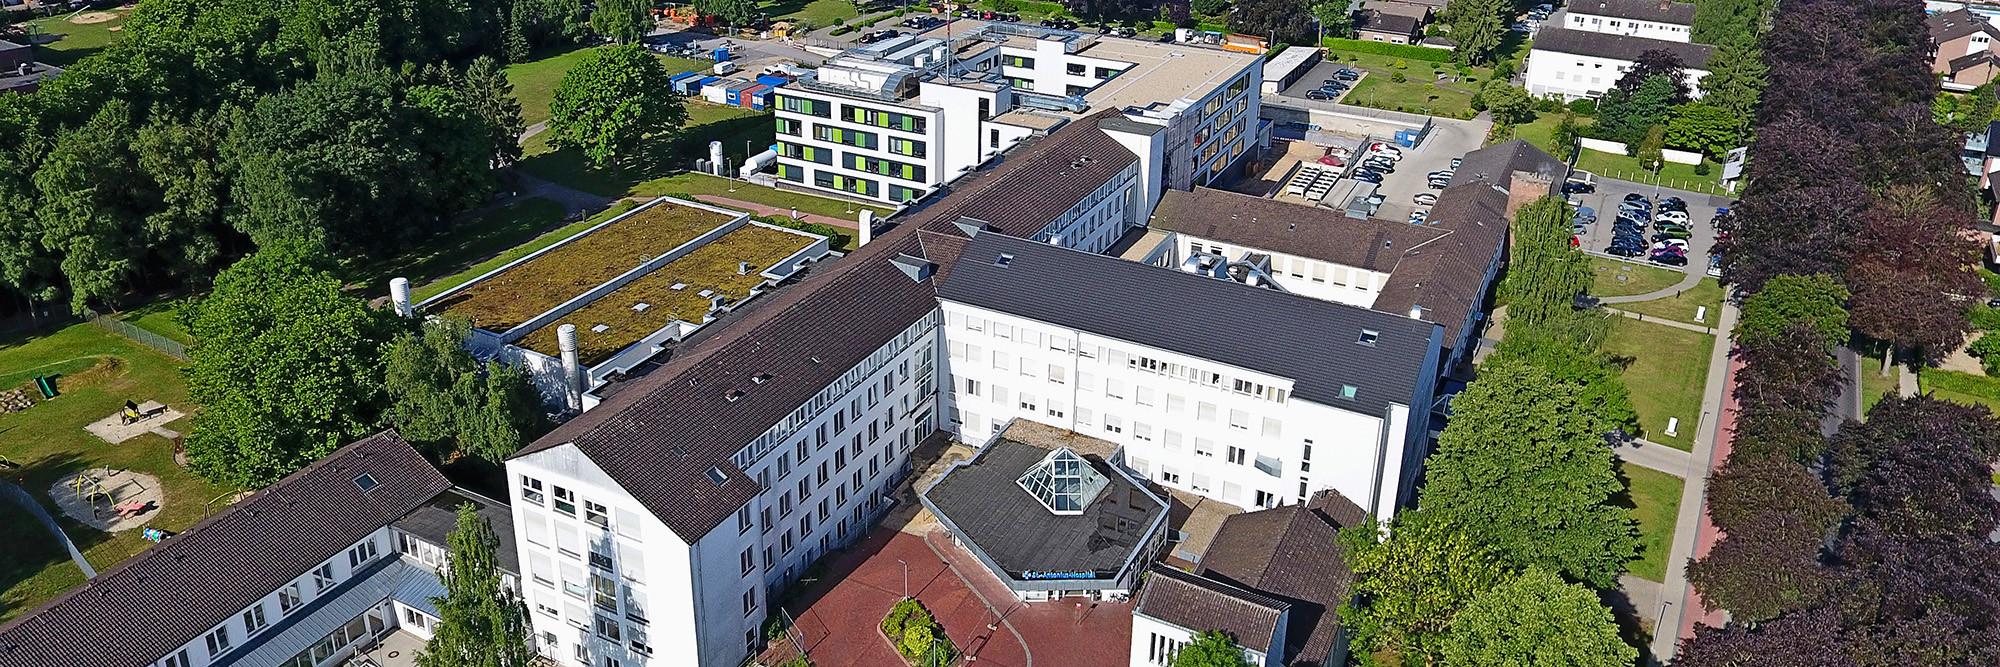 Luftaufnahme des St.-Antonius-Hospitals Kleve.